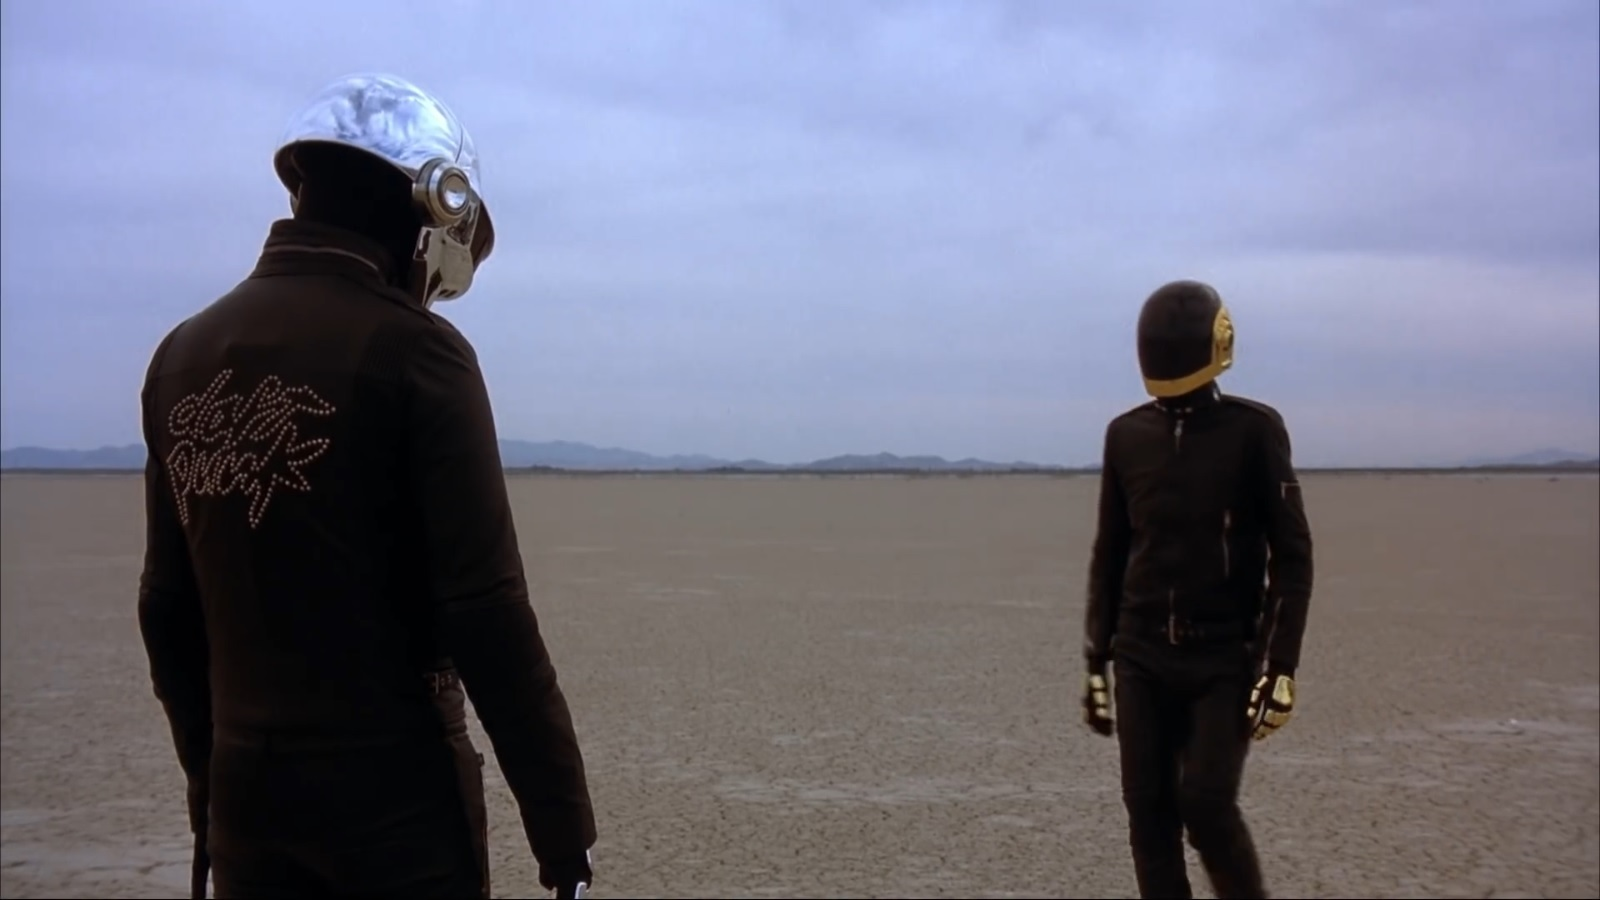 Fragment de 'Epilogue' de Daft Punk